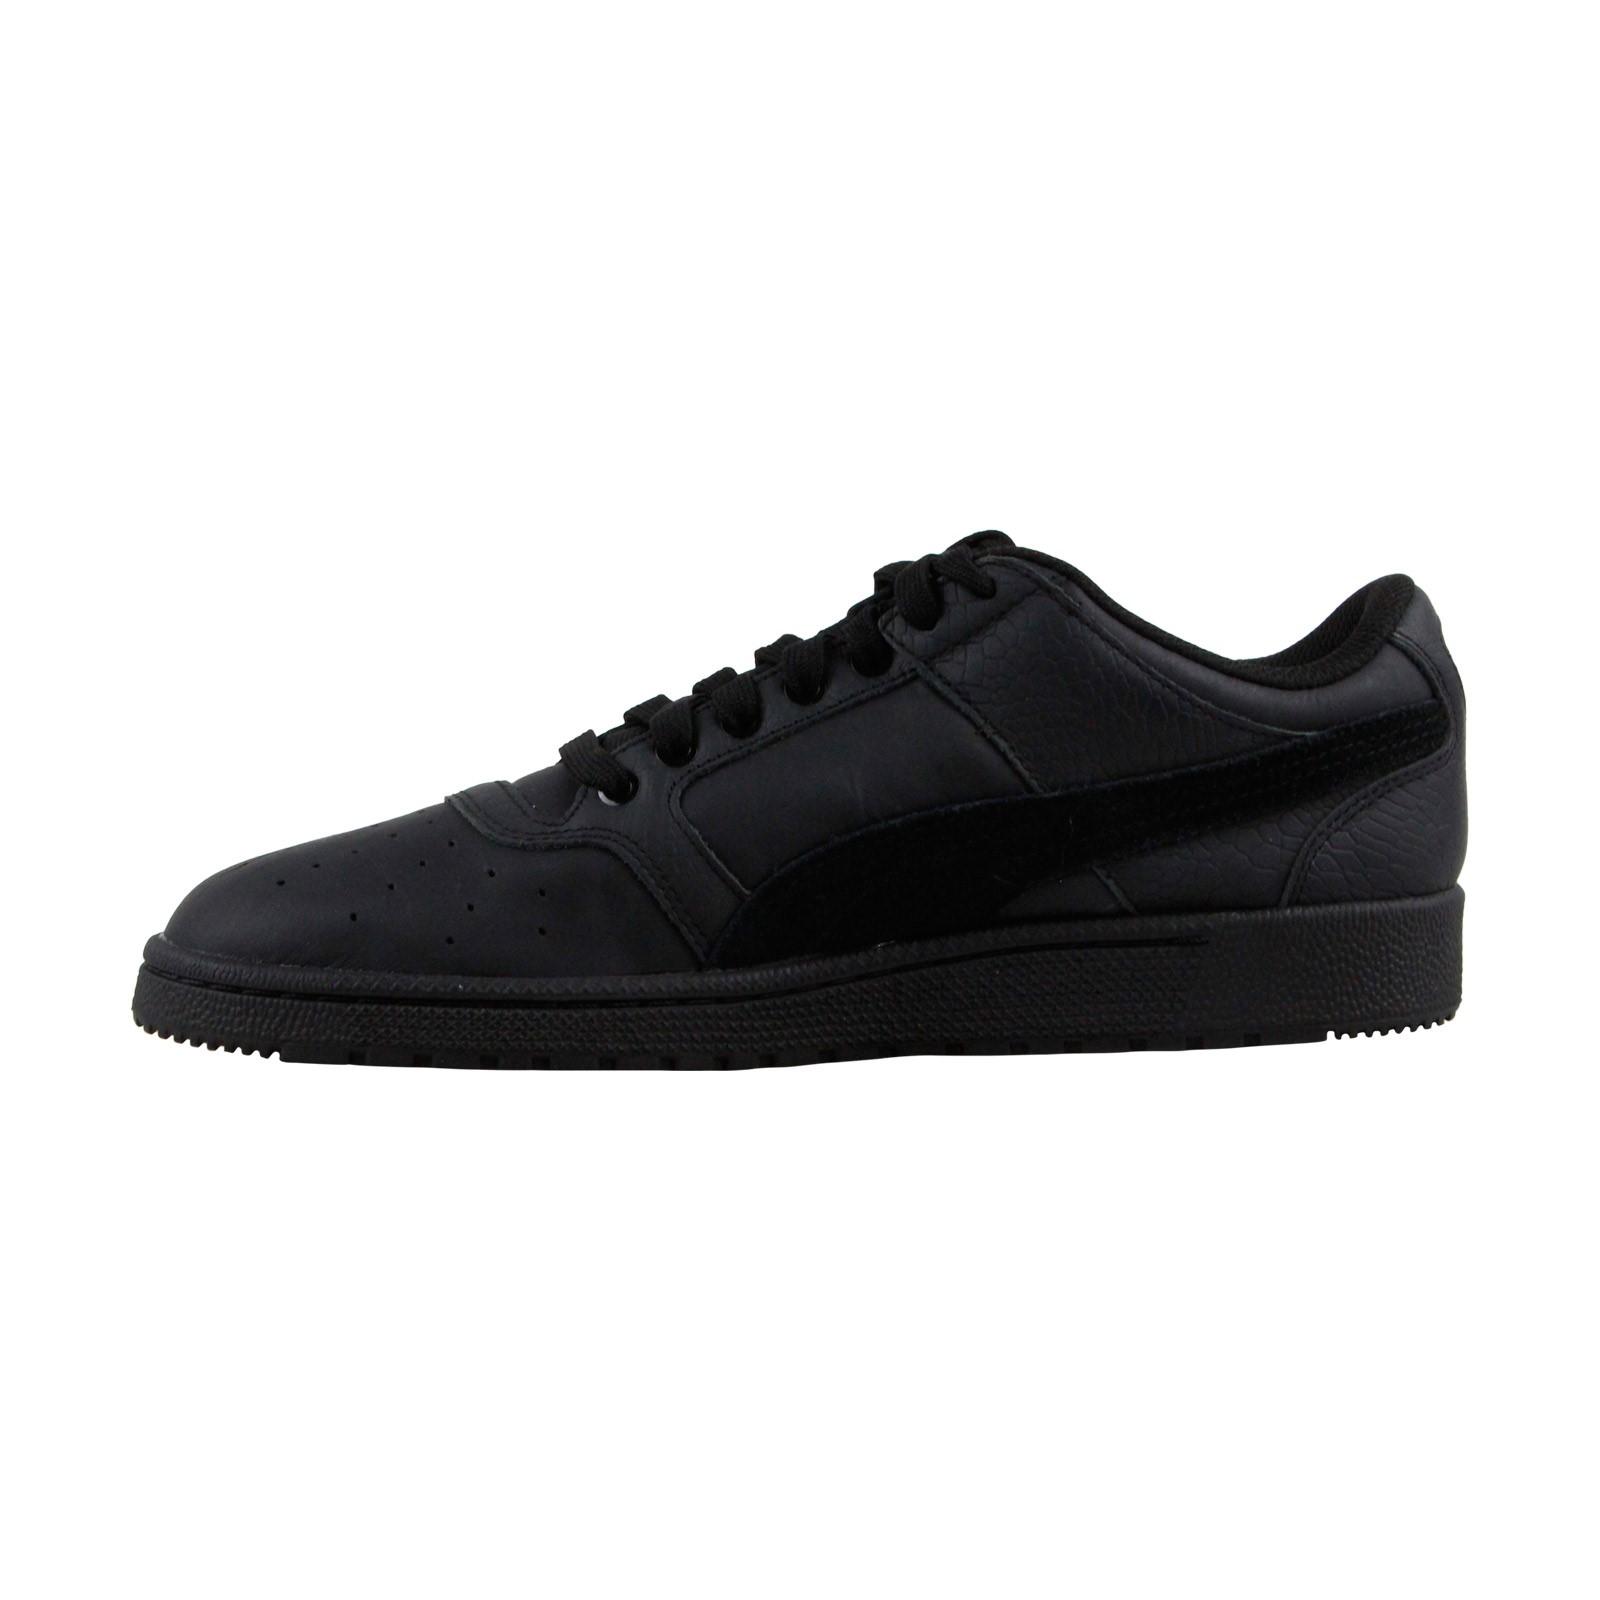 Puma Men's Sky Ii Lo Color Blocked Leather Whisper White-Whisper White Low Top Fashion Sneaker - 11.5M